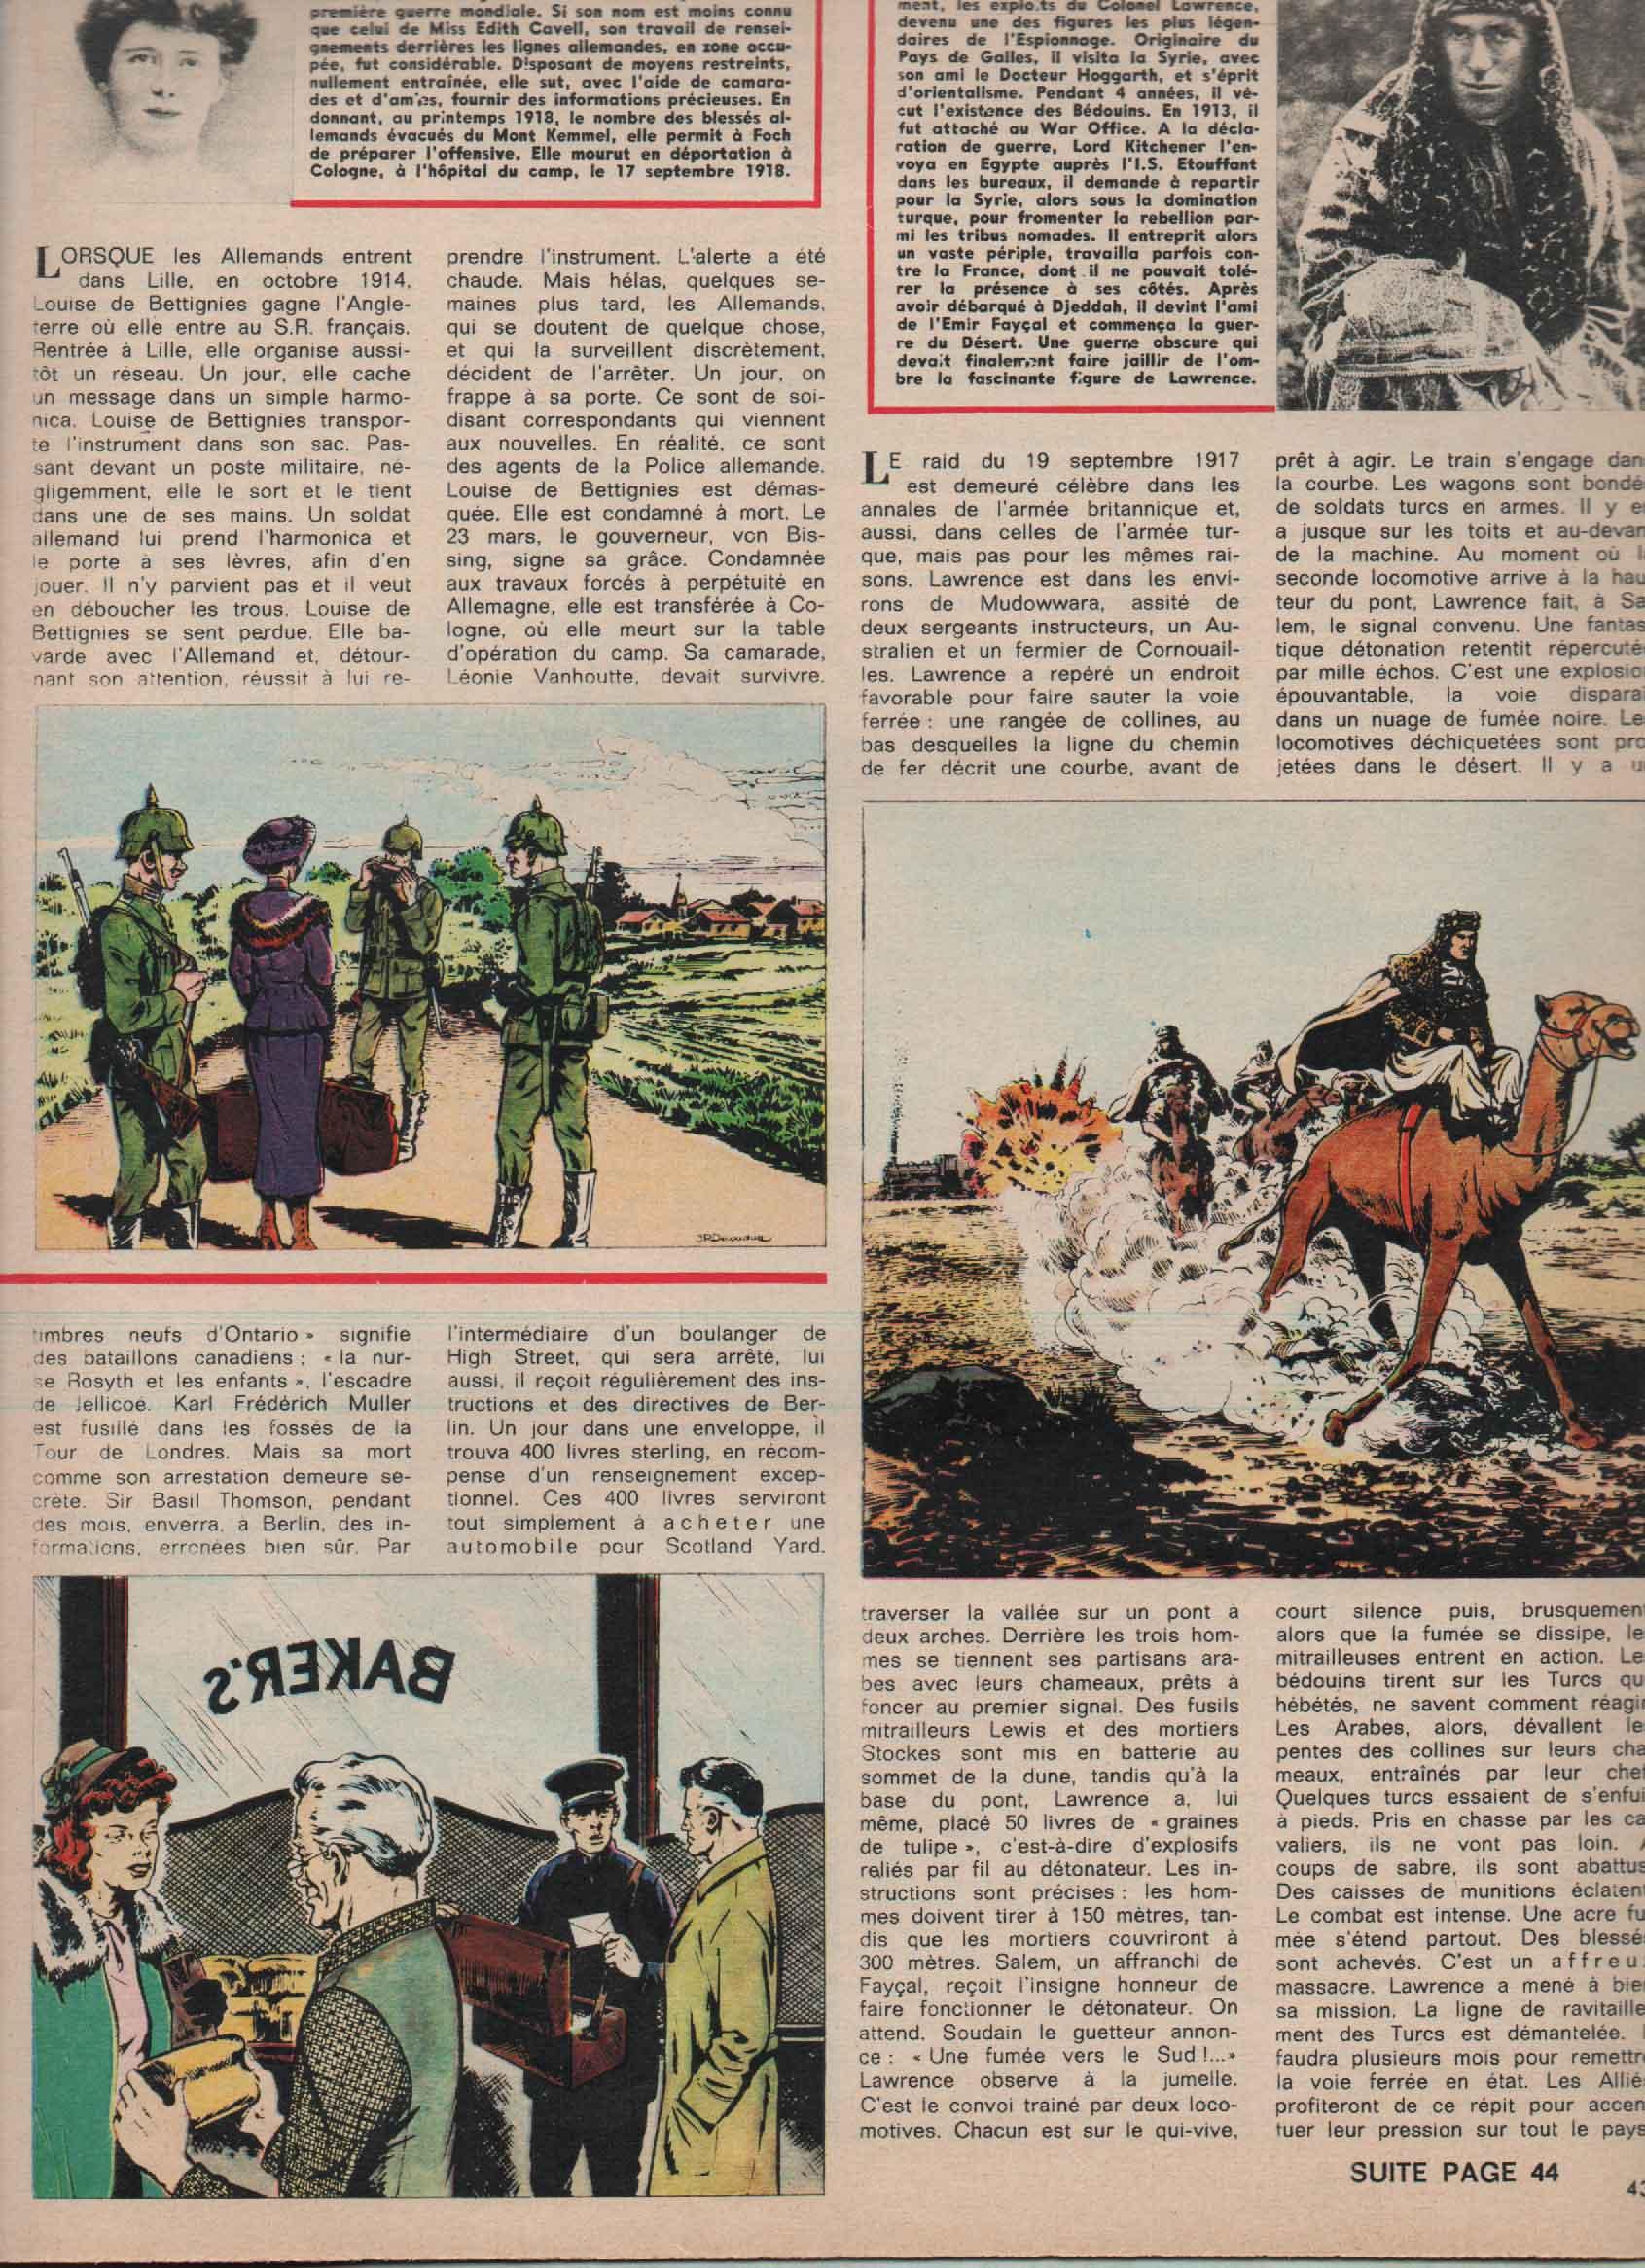 « Les Espions célèbres » Pilote n° 394 (11/05/1967).